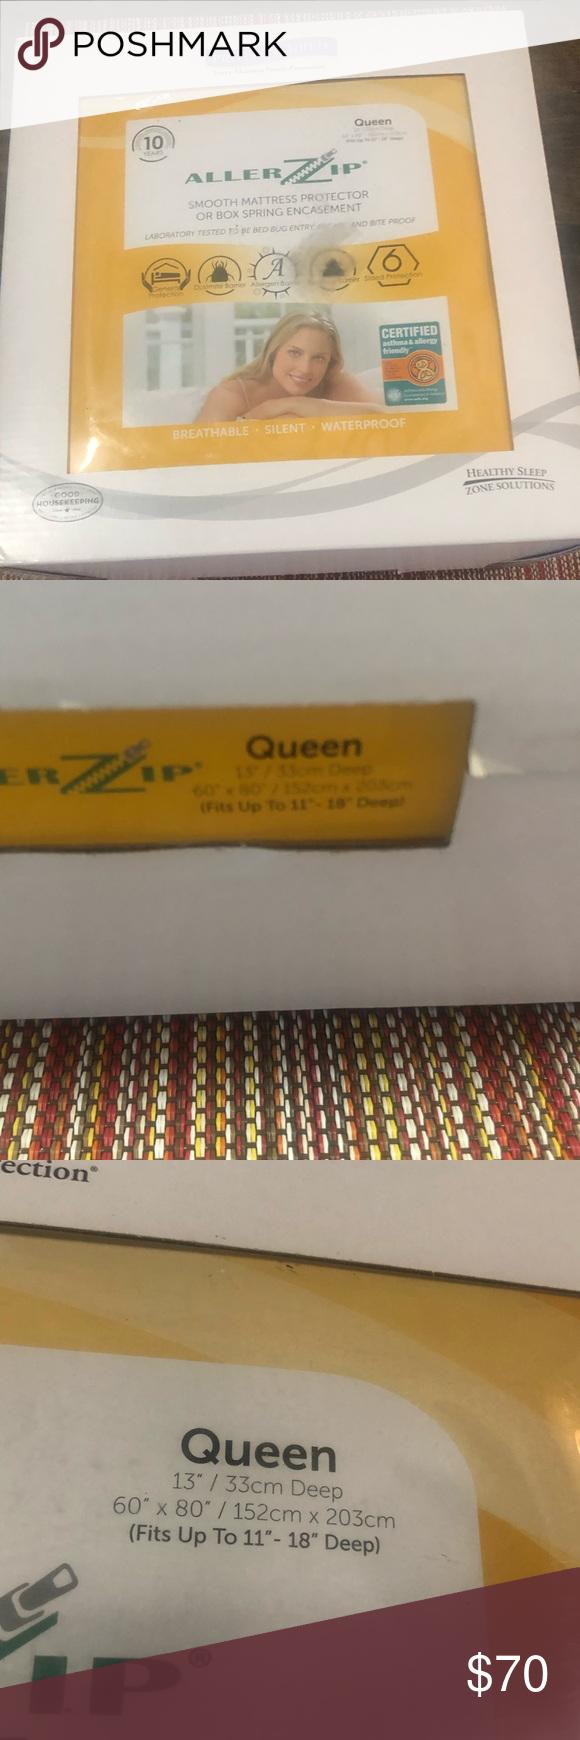 Protect a bed mattress protector encasement NWT Mattress